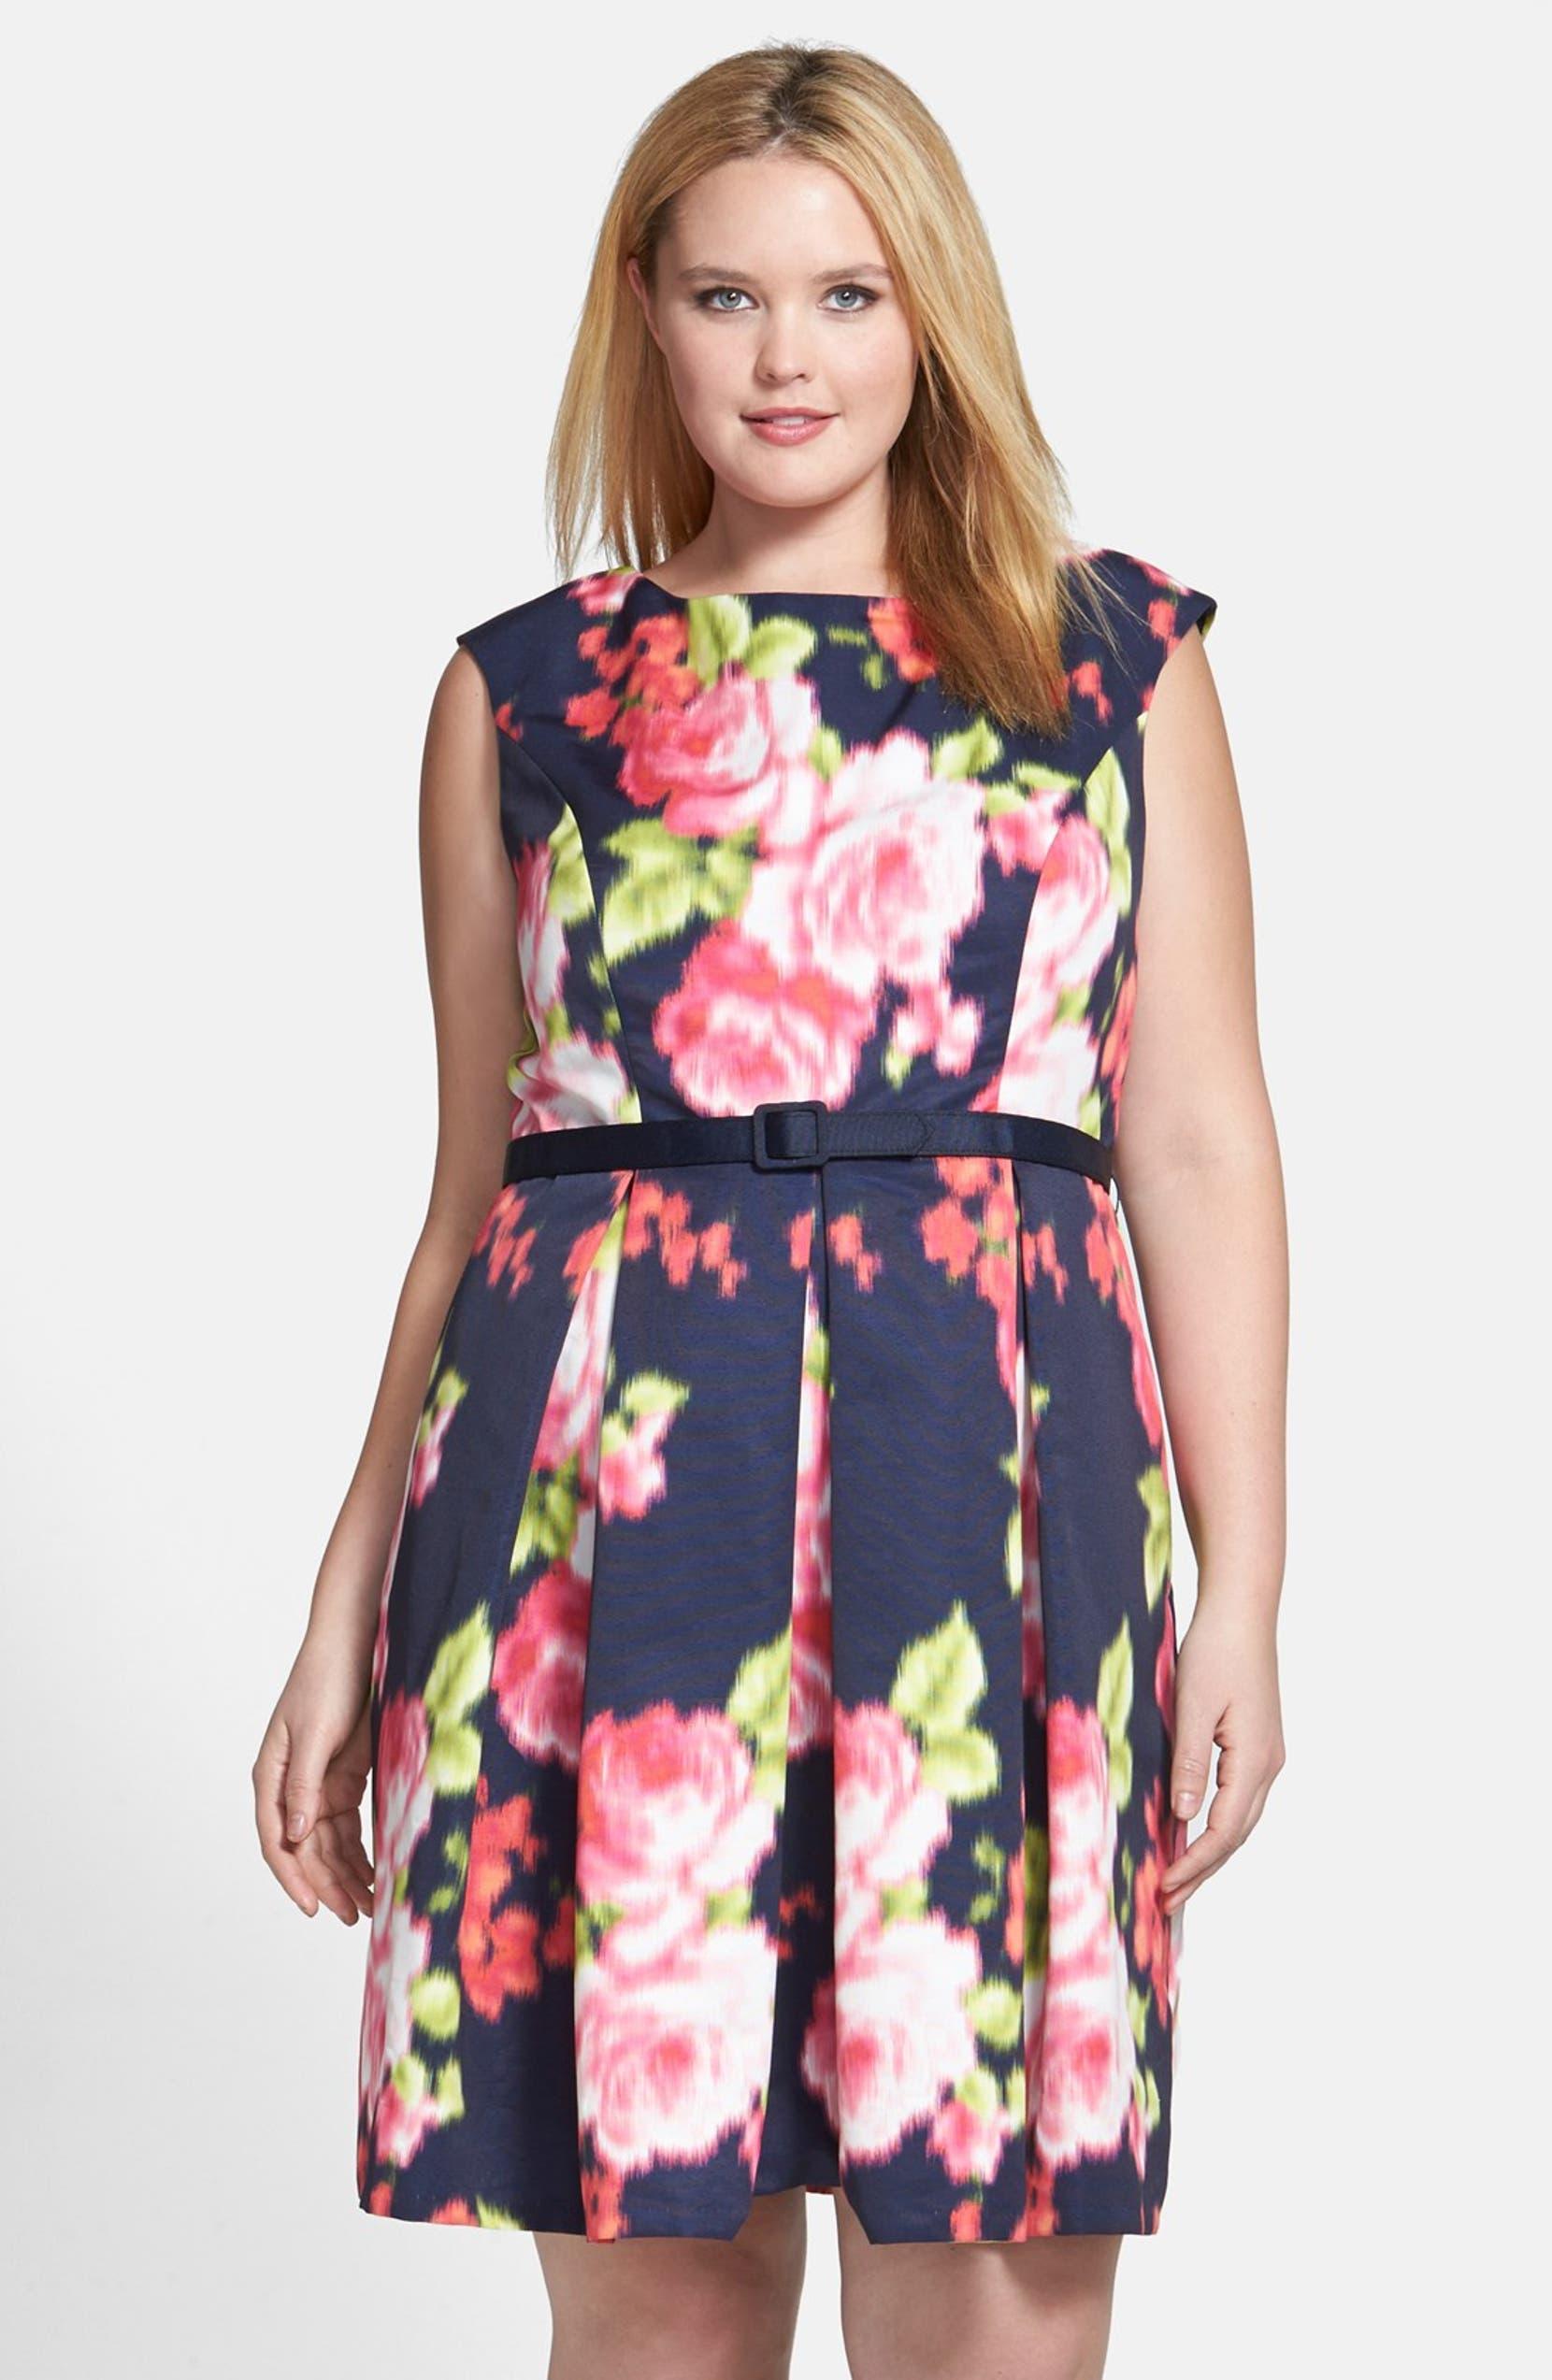 69cde1fb94 Eliza J Floral Print Cap Sleeve Fit   Flare Dress (Plus Size ...